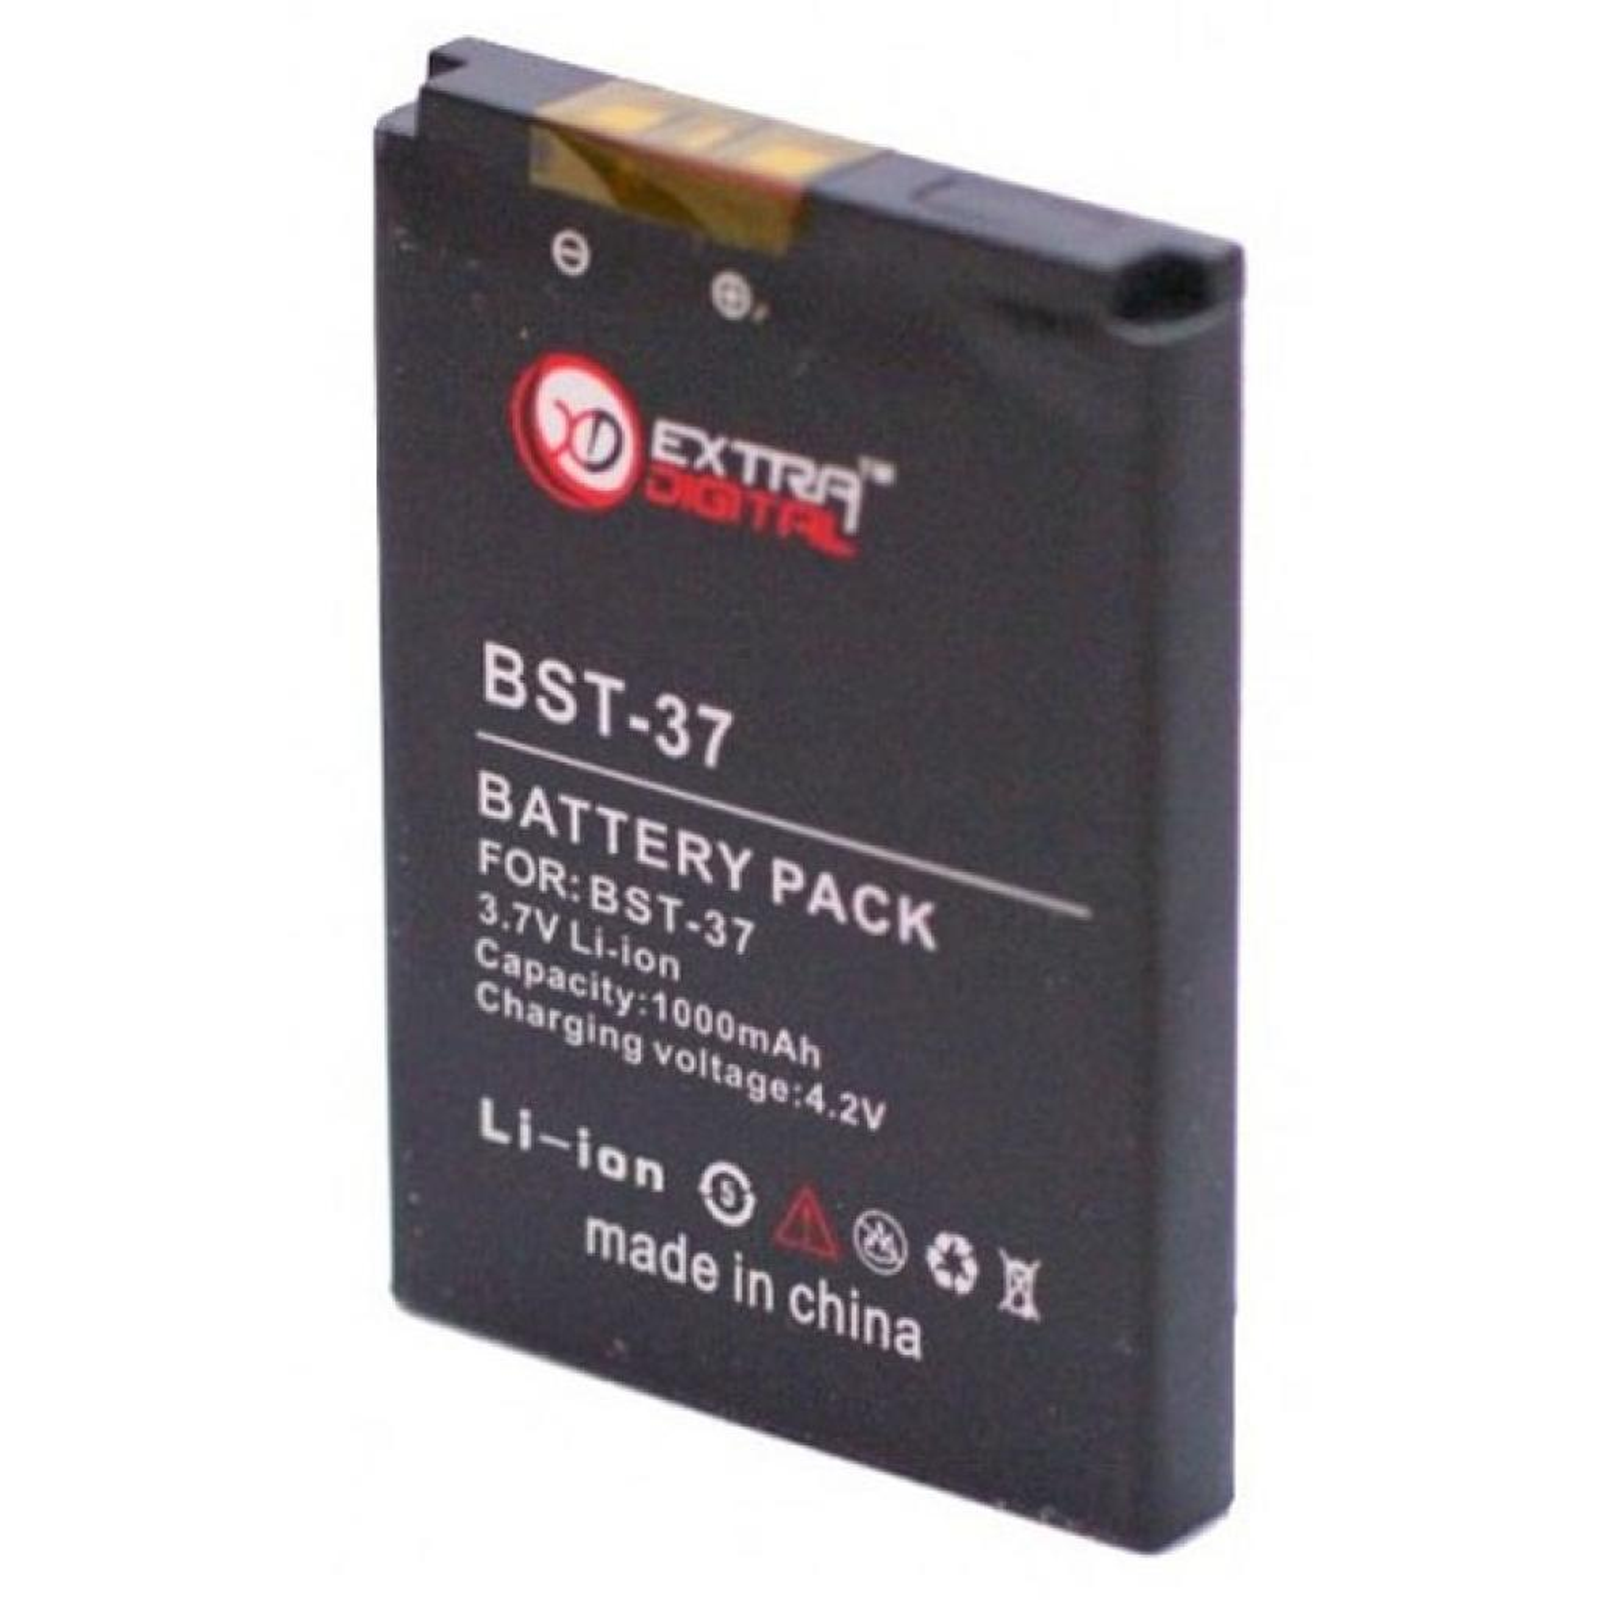 Аккумуляторная батарея EXTRADIGITAL Sony Ericsson BST-37 (1000 mAh) (BMS6351) изображение 2